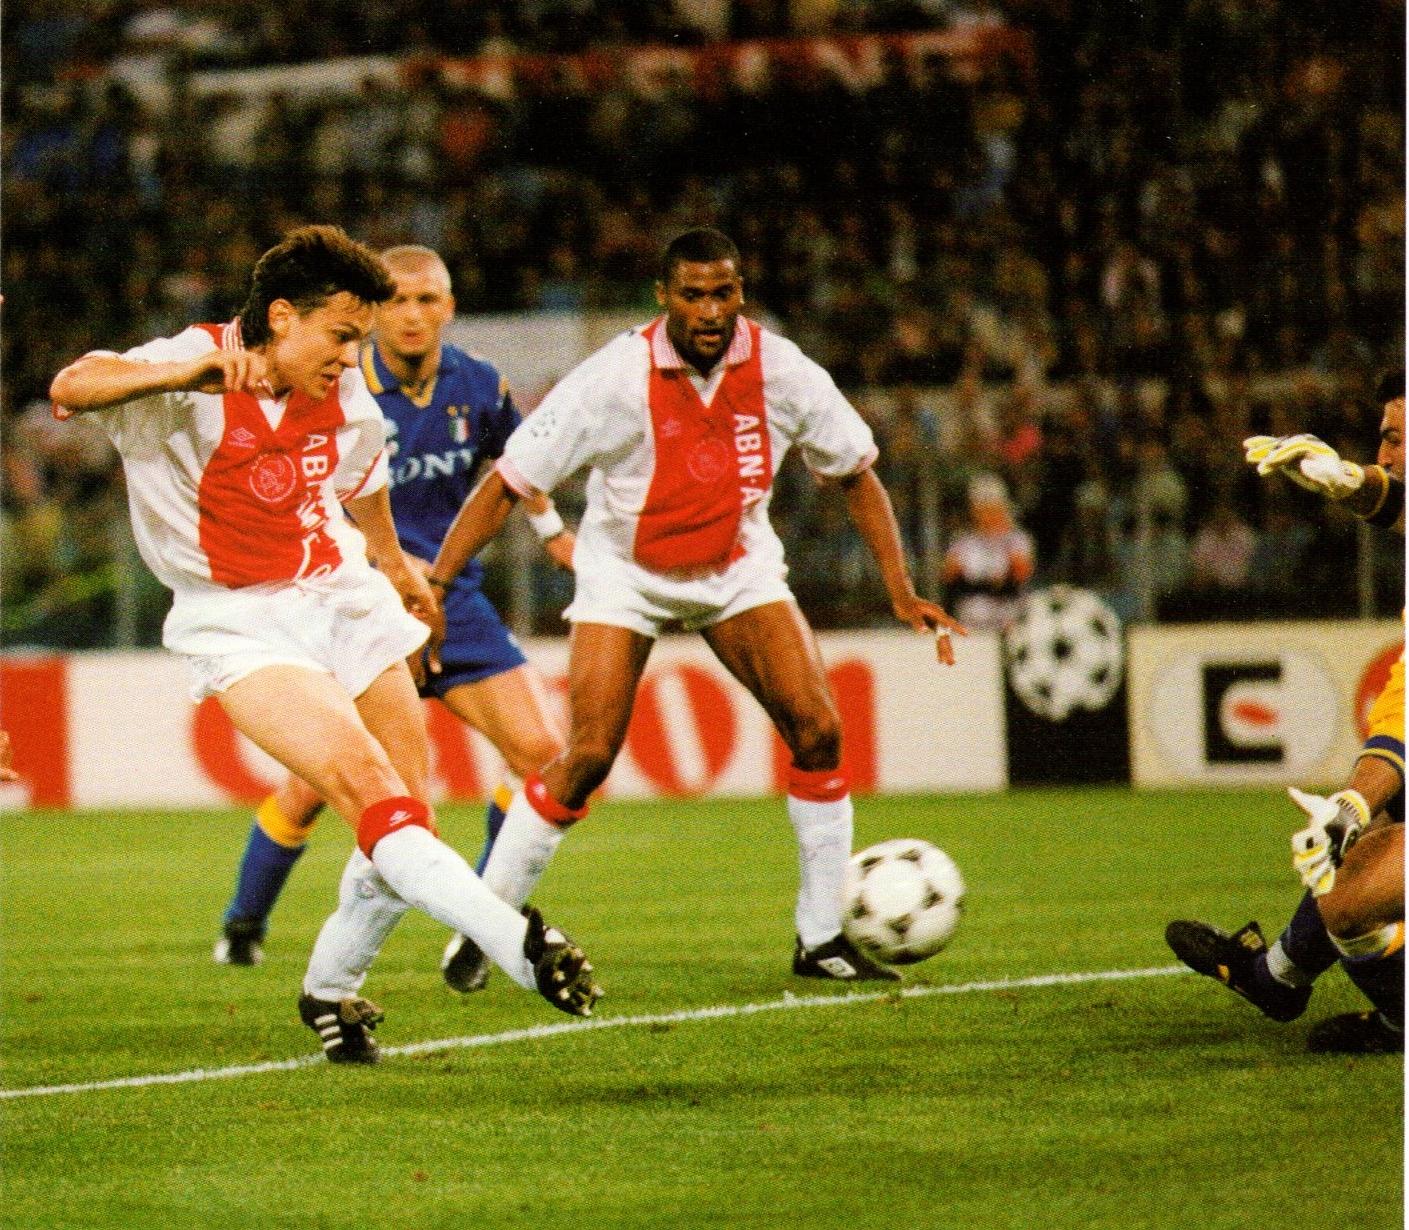 Soccer Nostalgia: Old Match Photographs-Part 32h